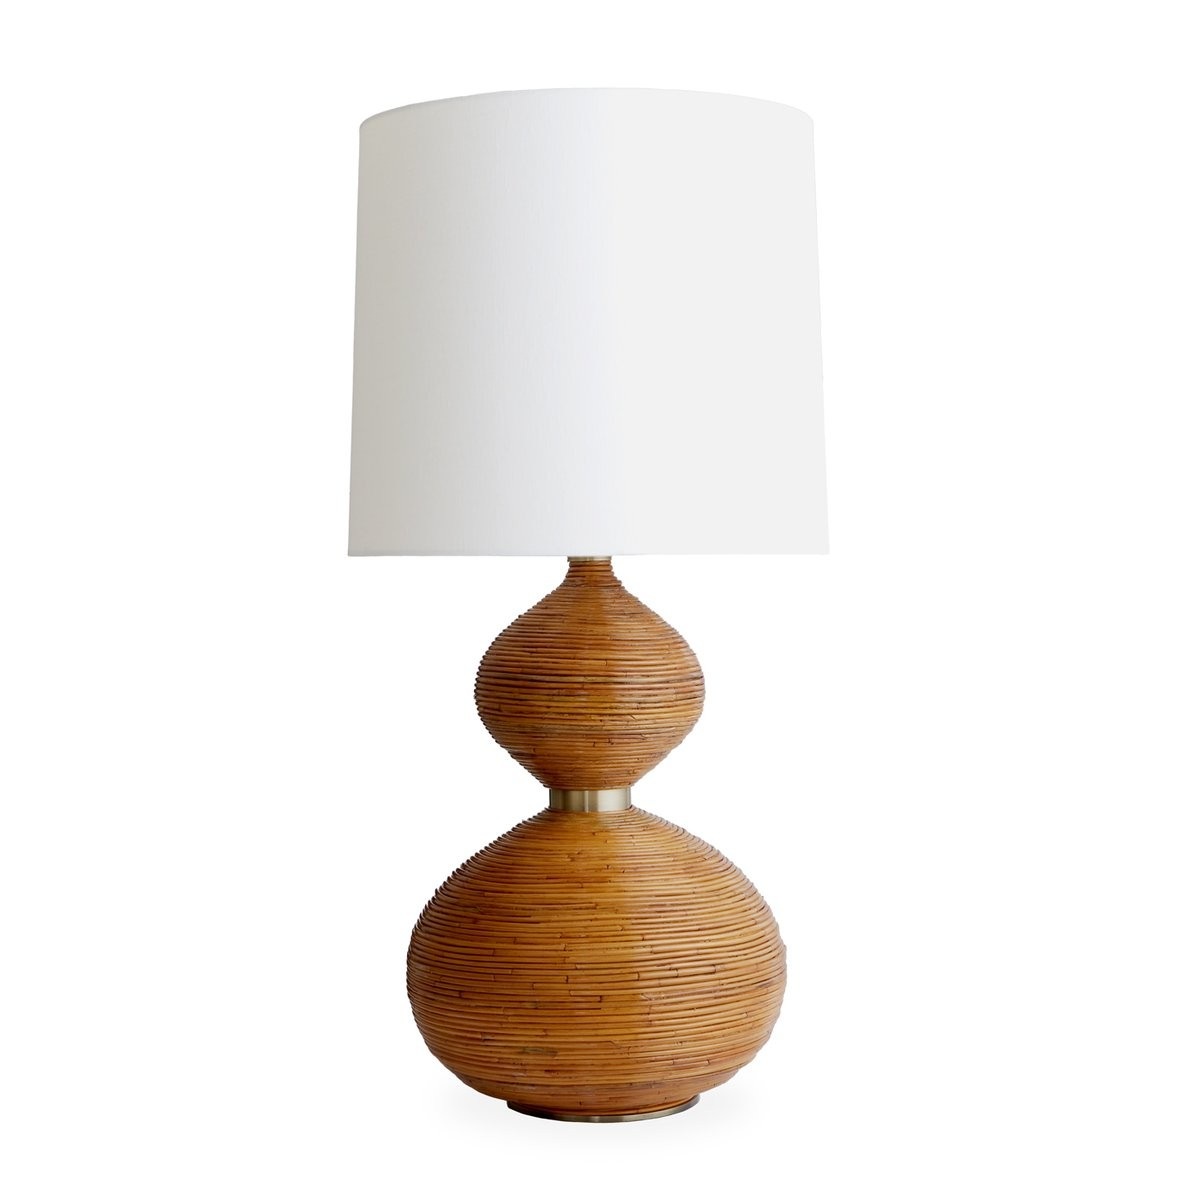 Jonathan Adler I Riviera Table Lamp